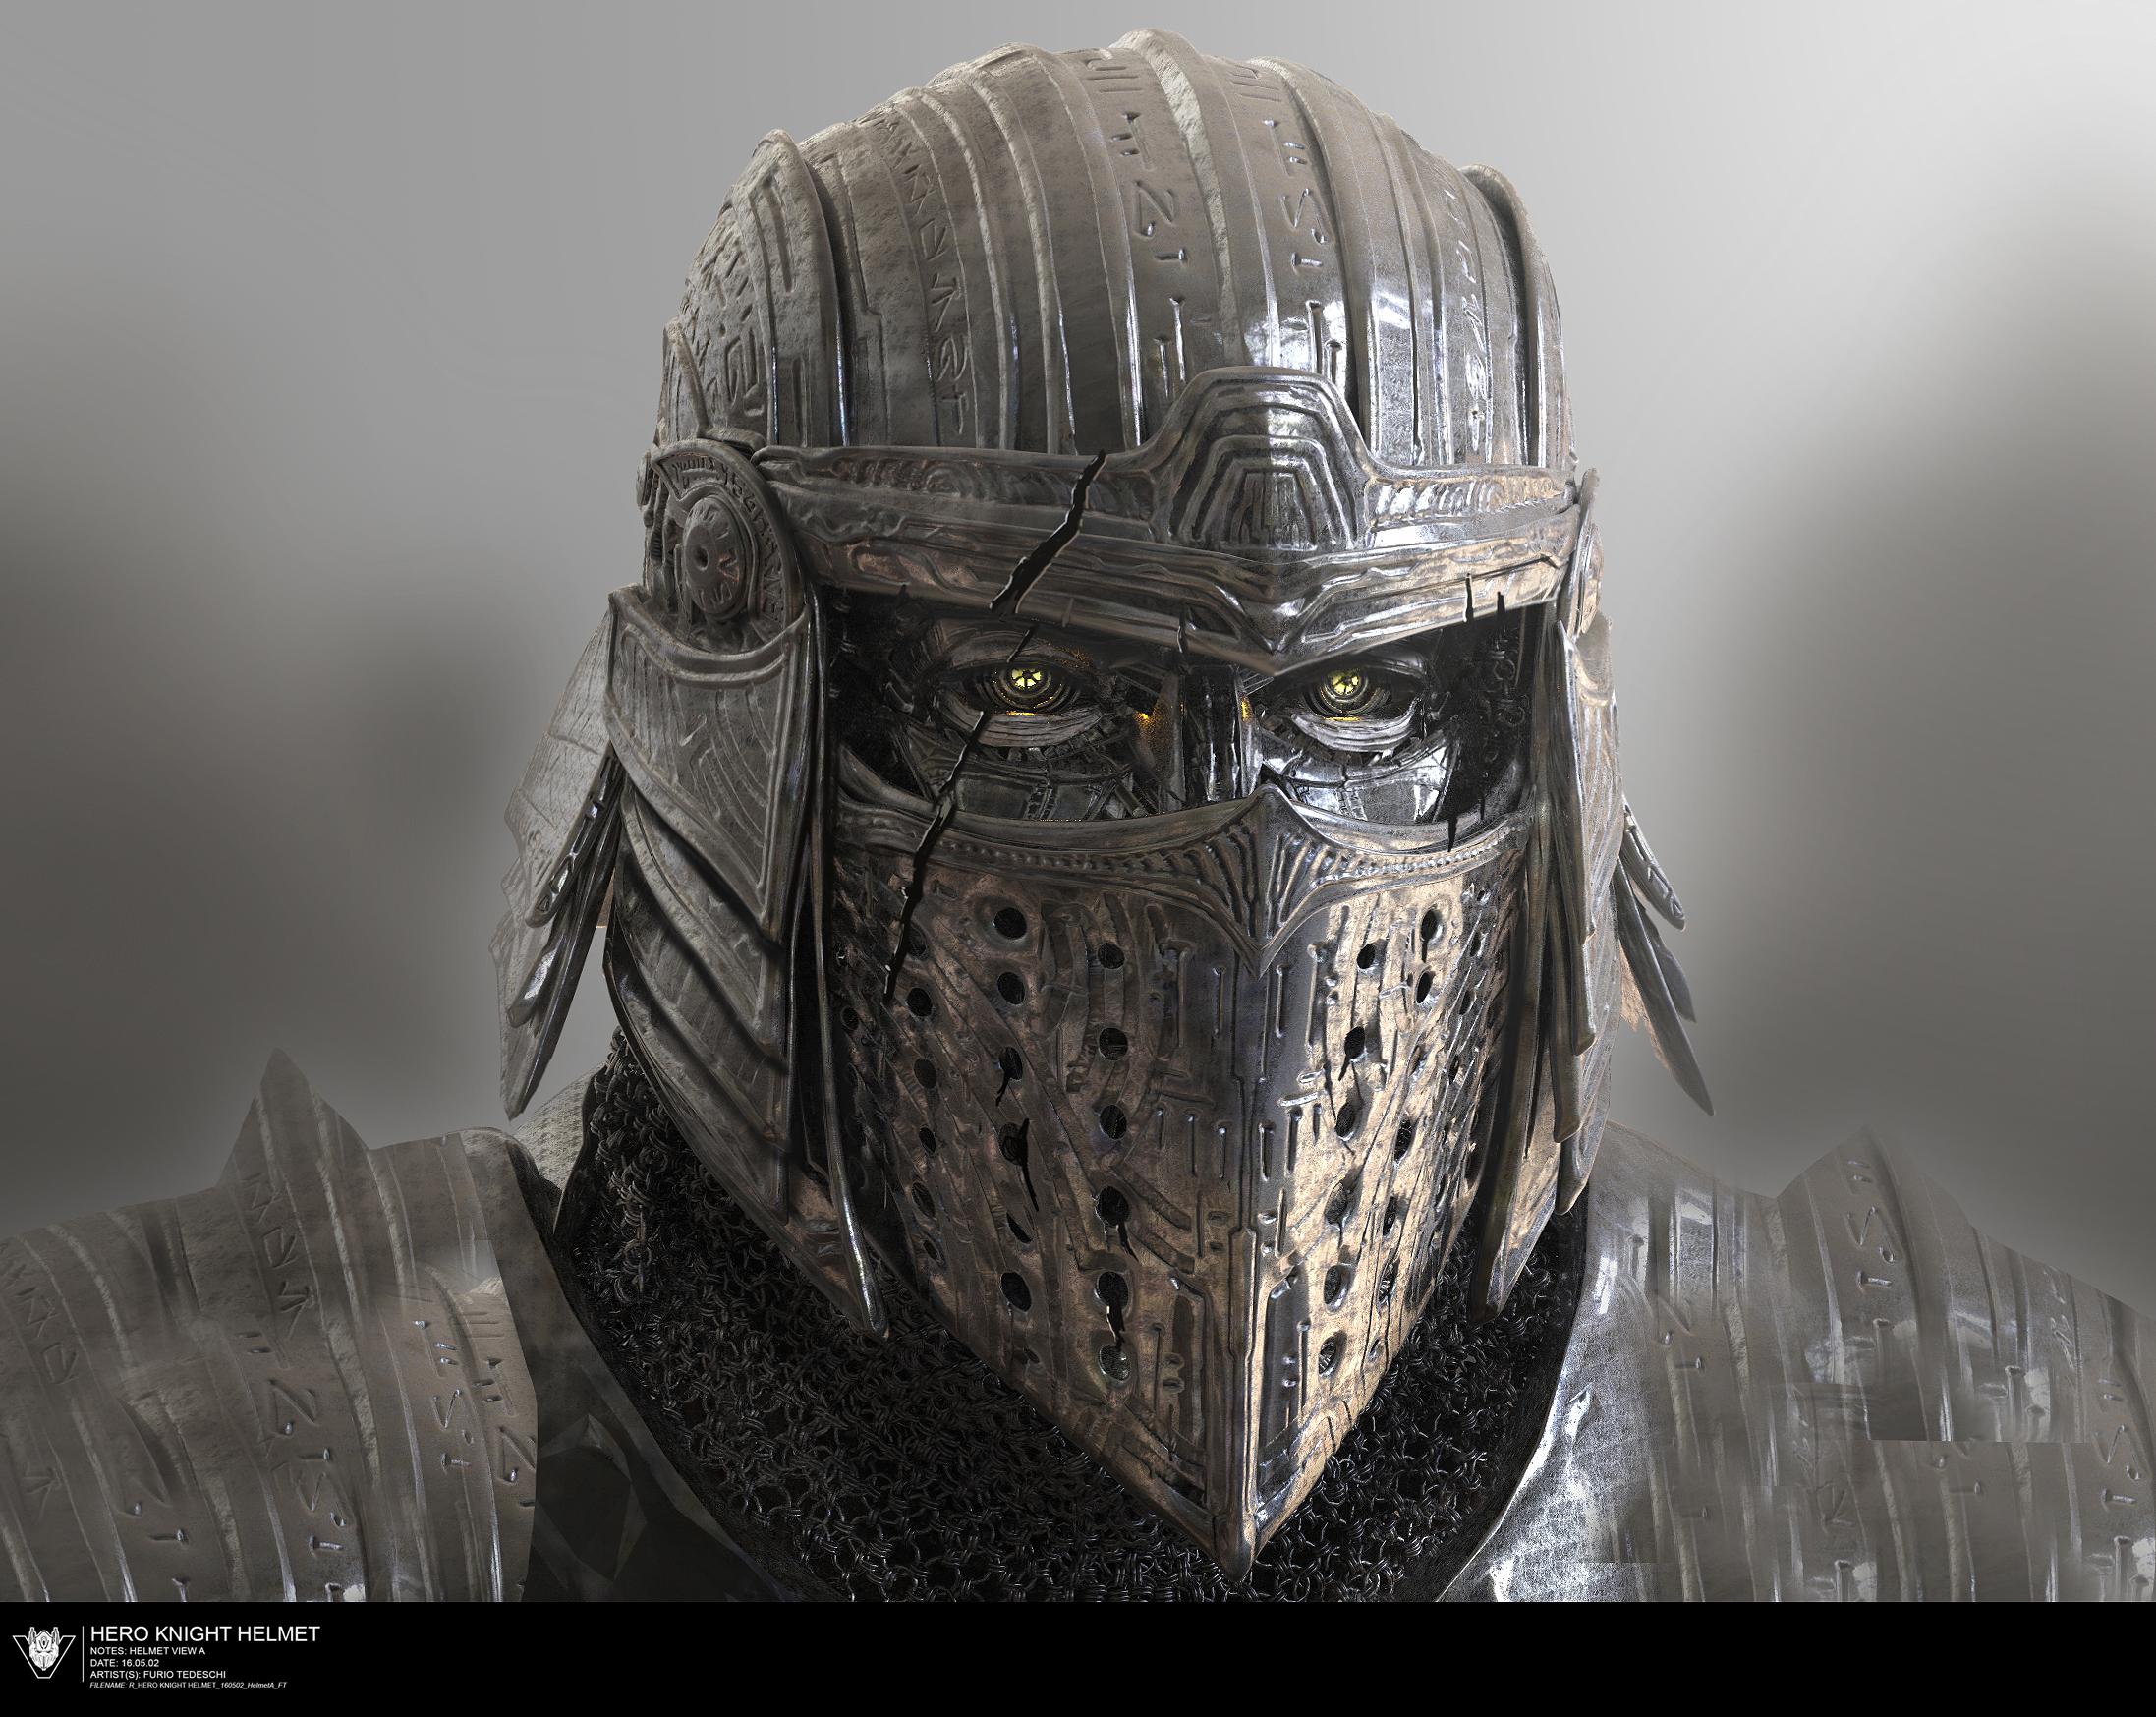 R_HERO KNIGHT HELMET_160502_HelmetA_FT.jpg